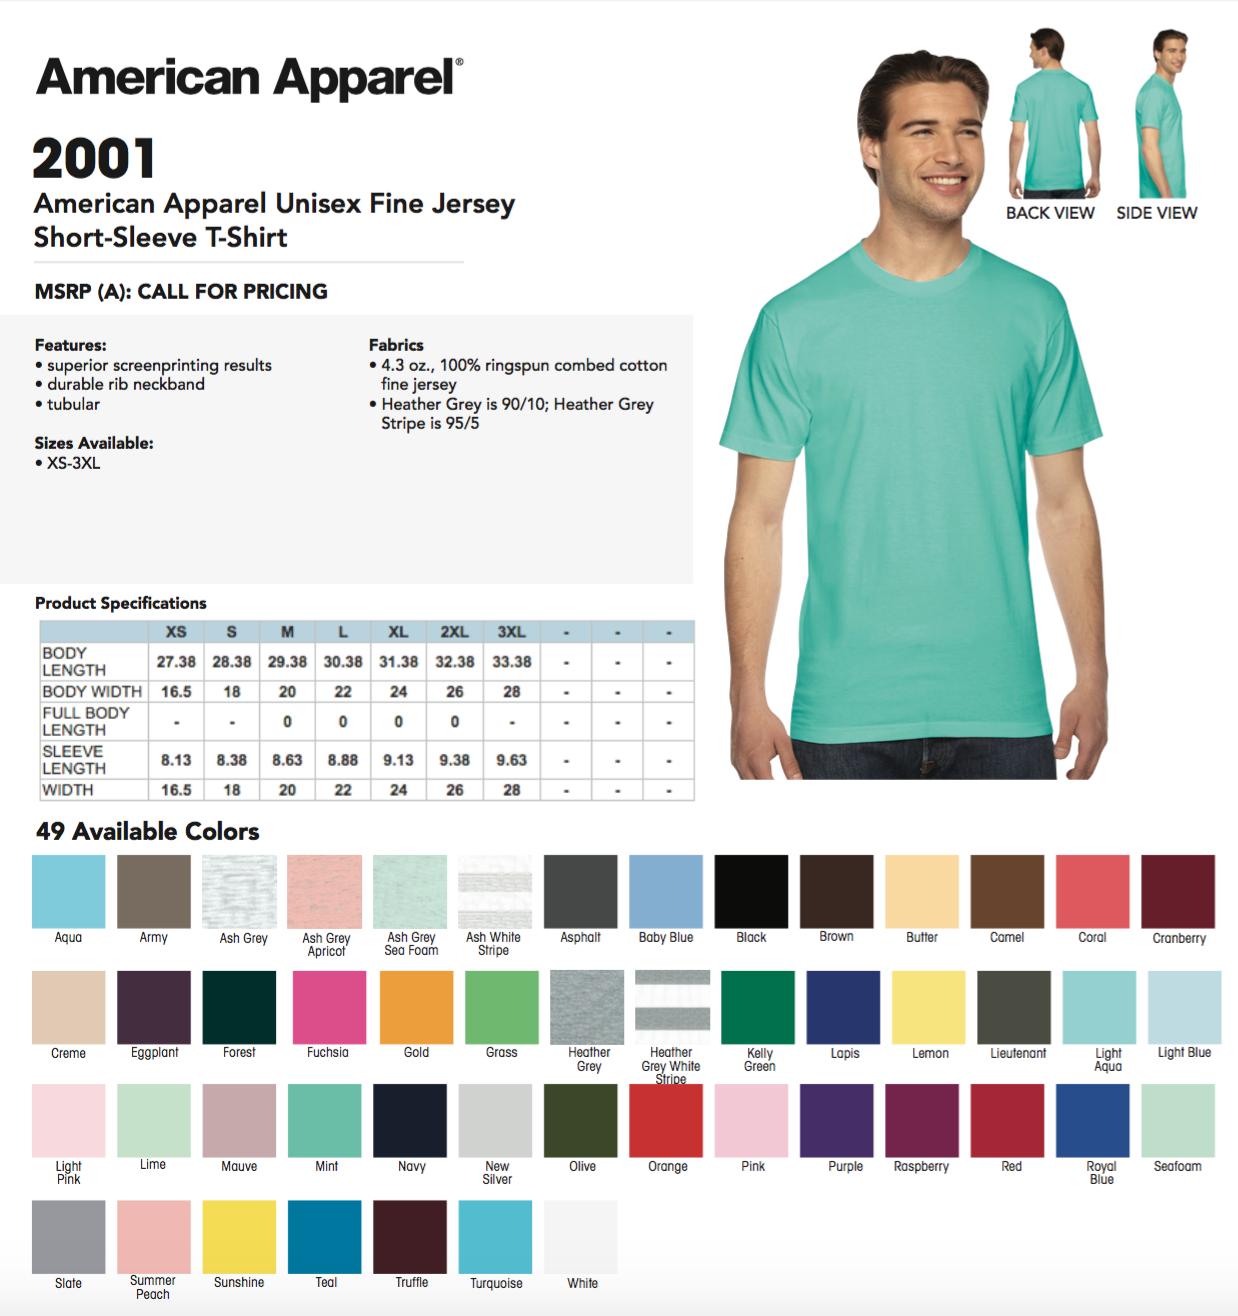 Heren: kleding 100 Gildan T-SHIRTS BLANK BULK LOT Colors or 112